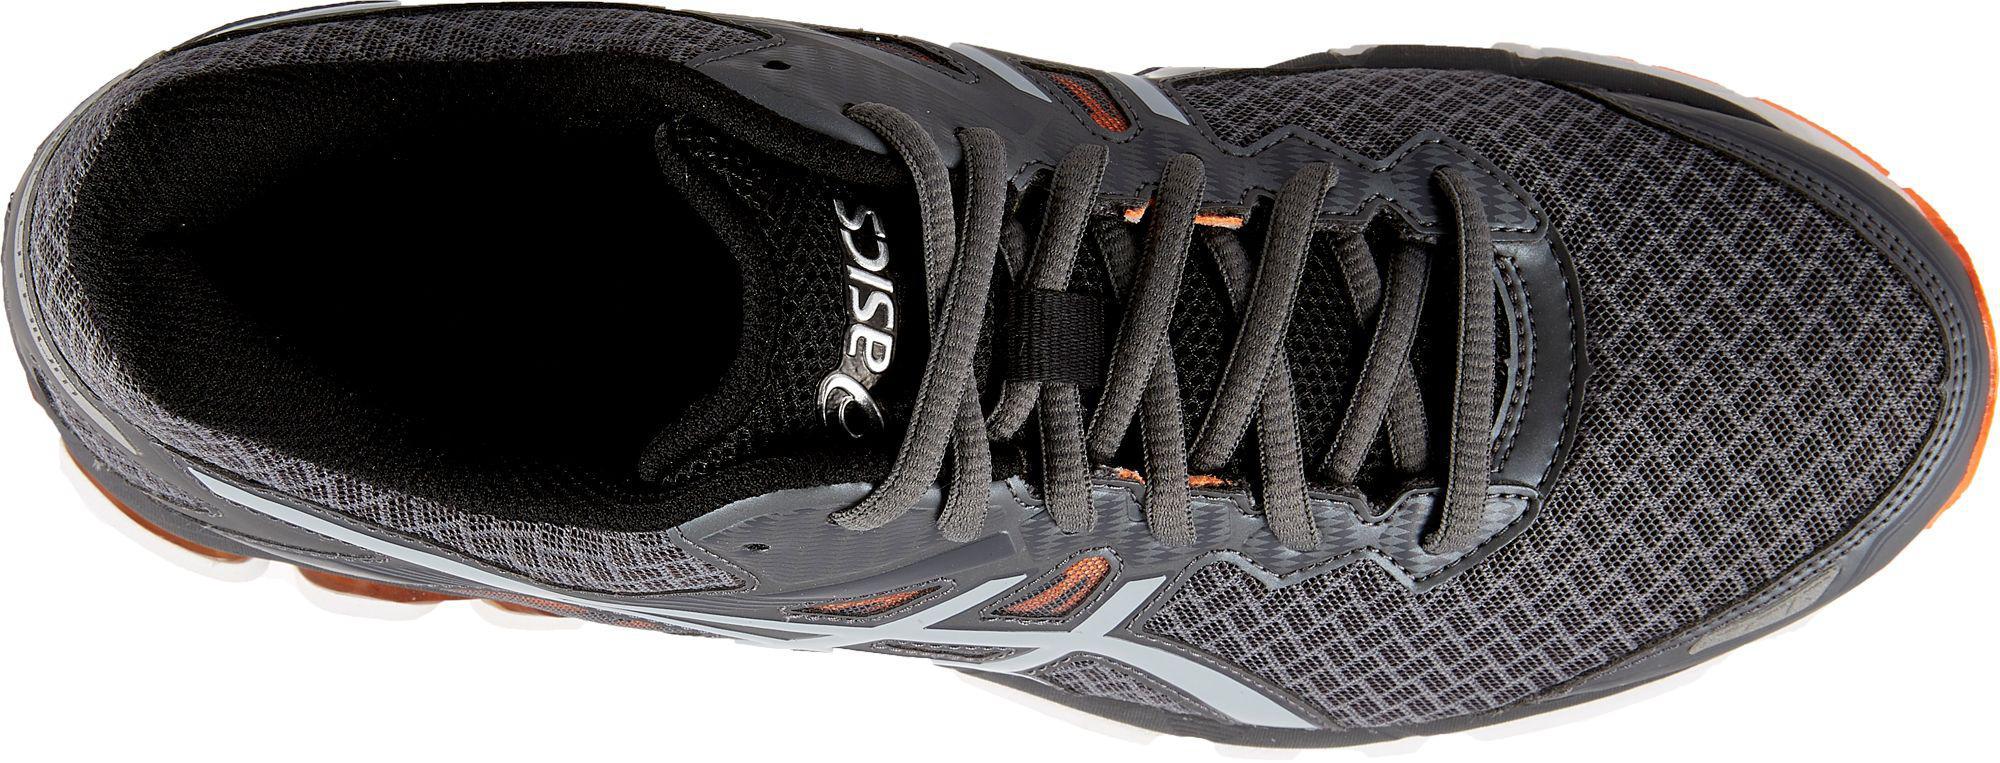 Gel-lithium 2 Running Shoes